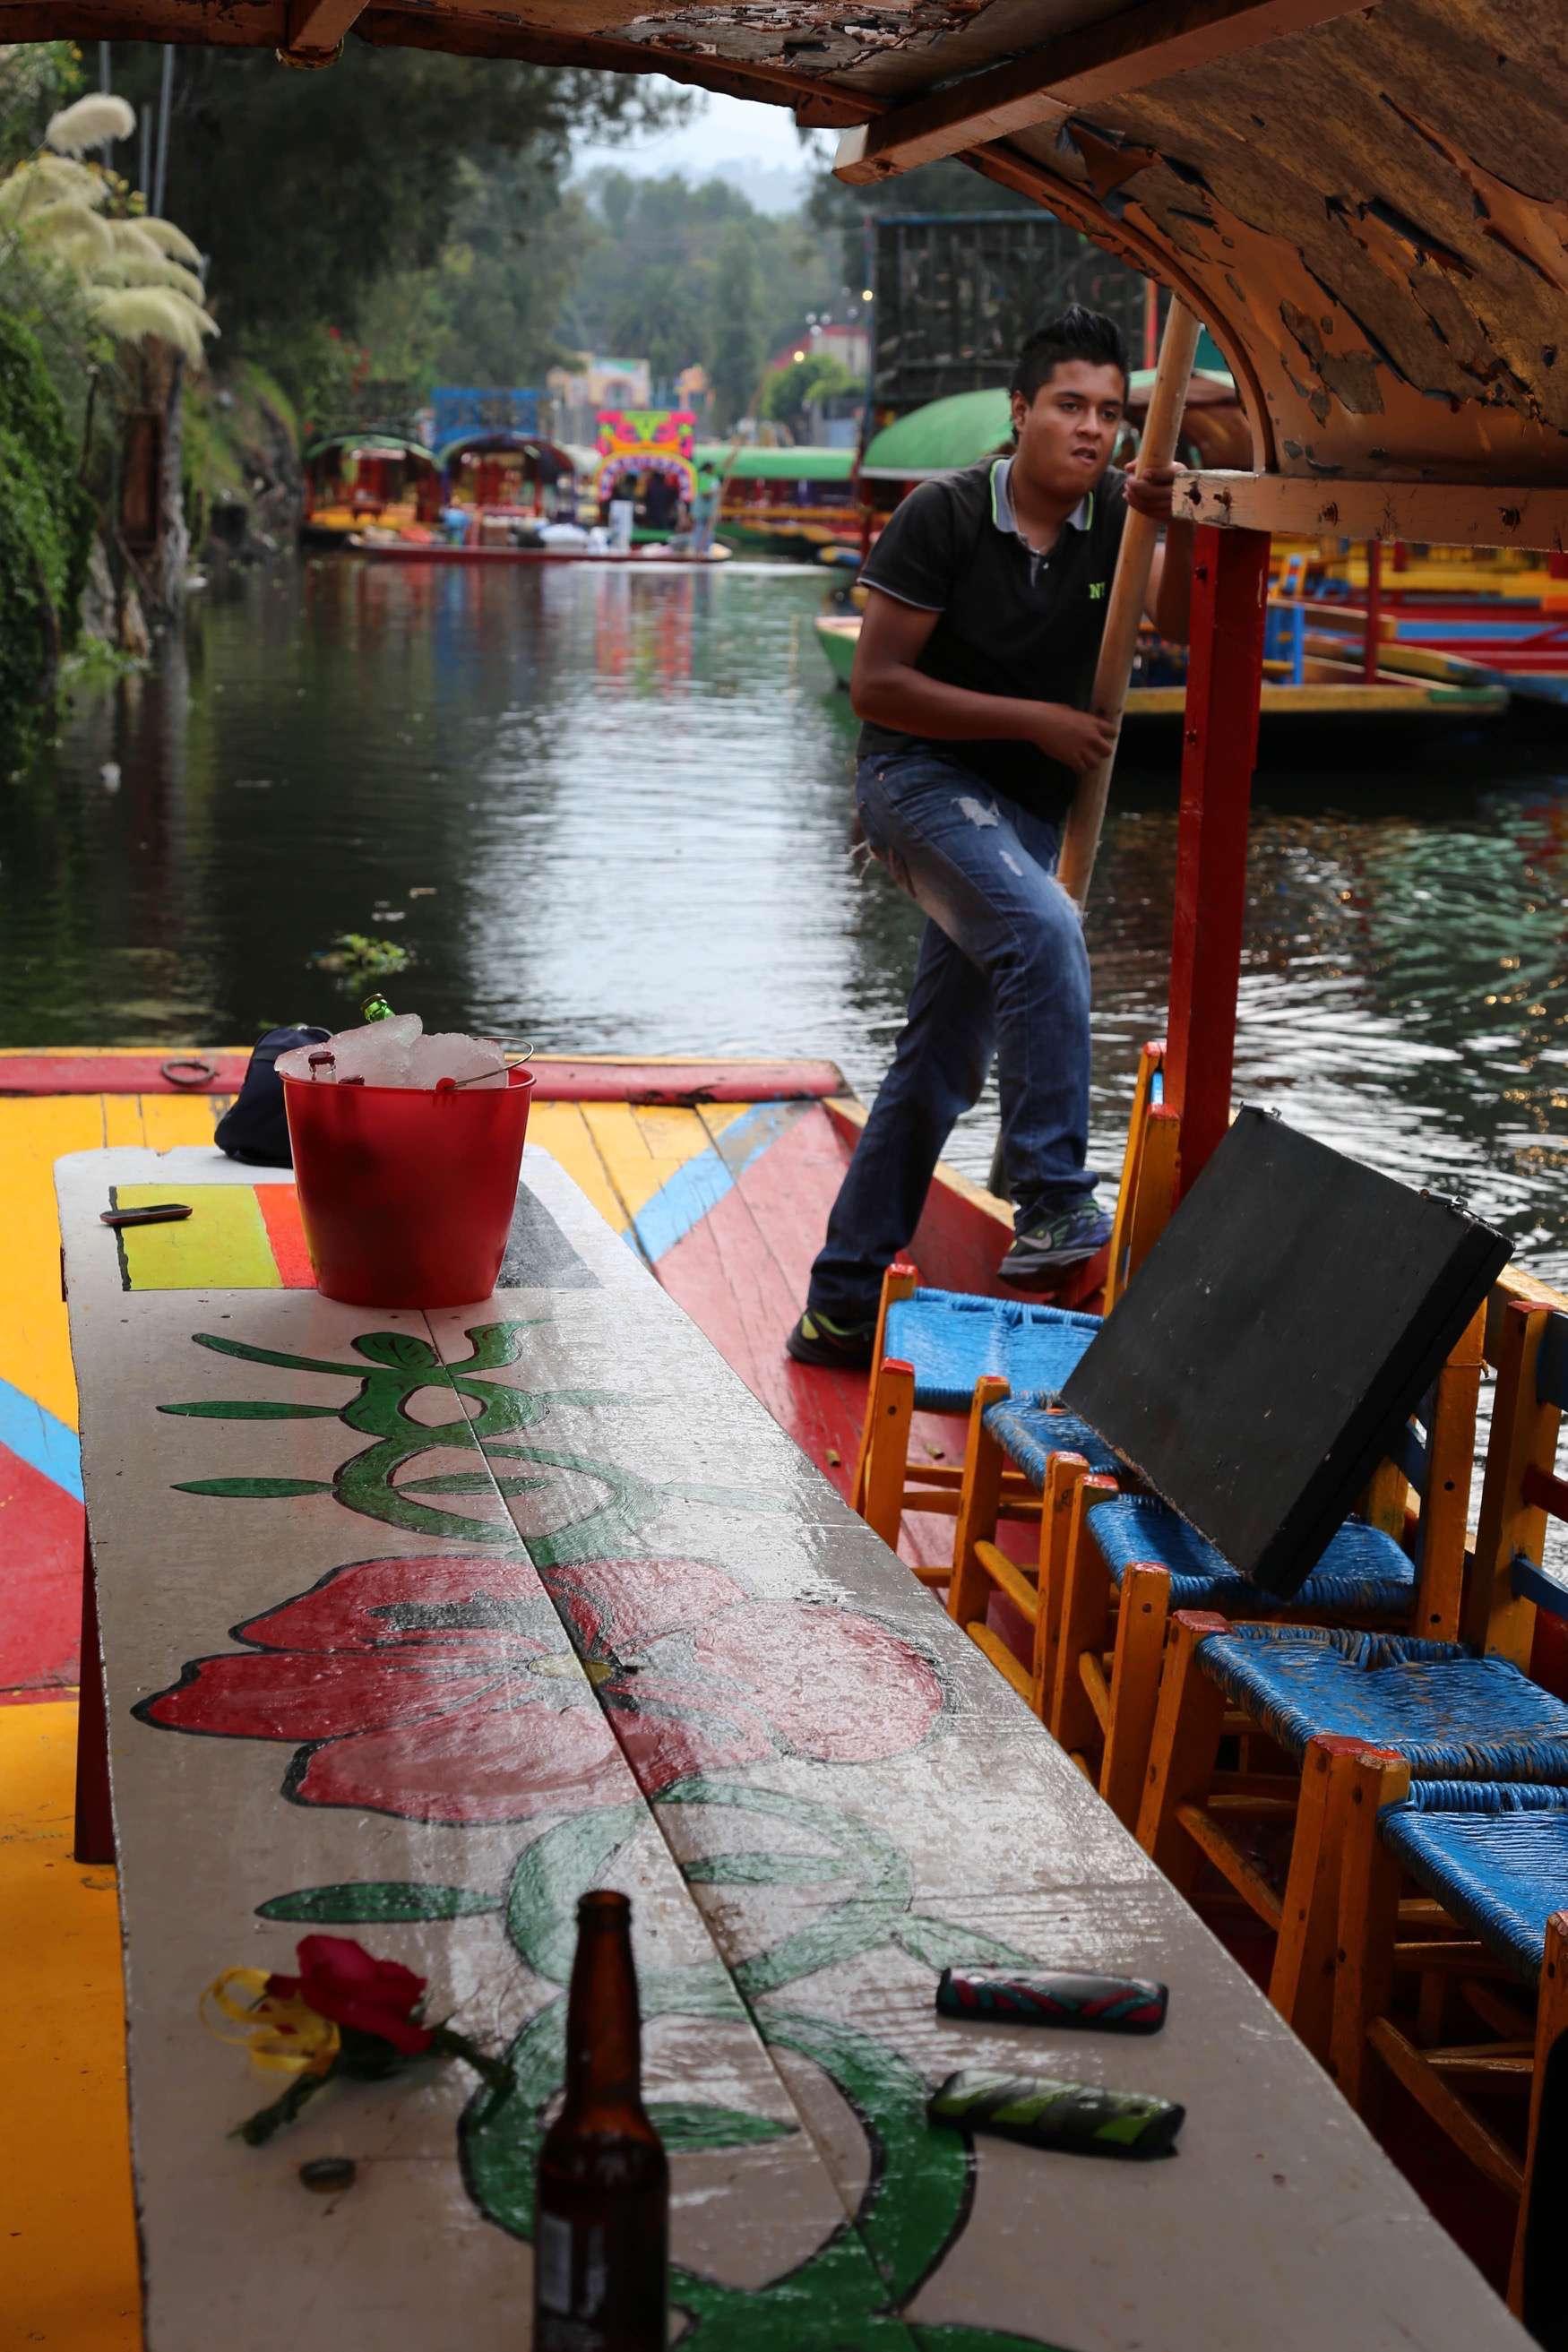 A 'captain' poles his trajinera along the water.